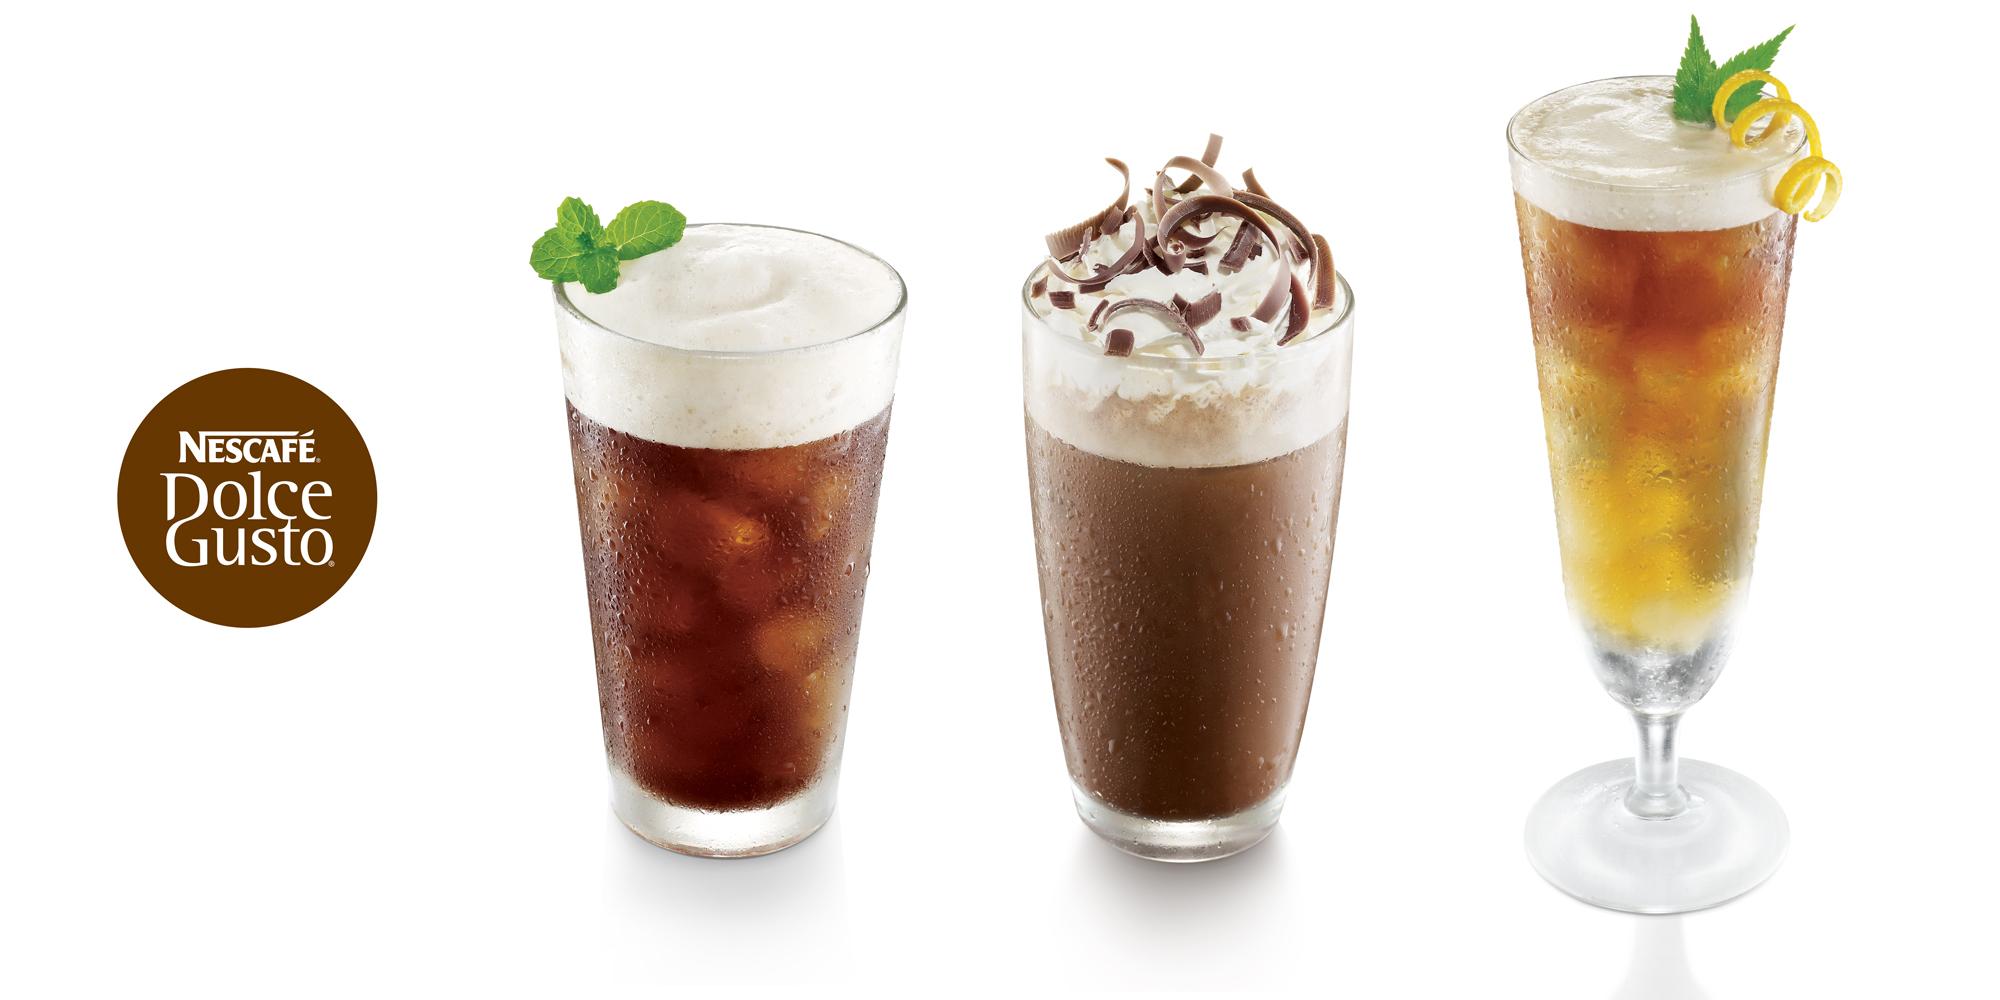 Nescafe Dolce Gusto Mix Recipe